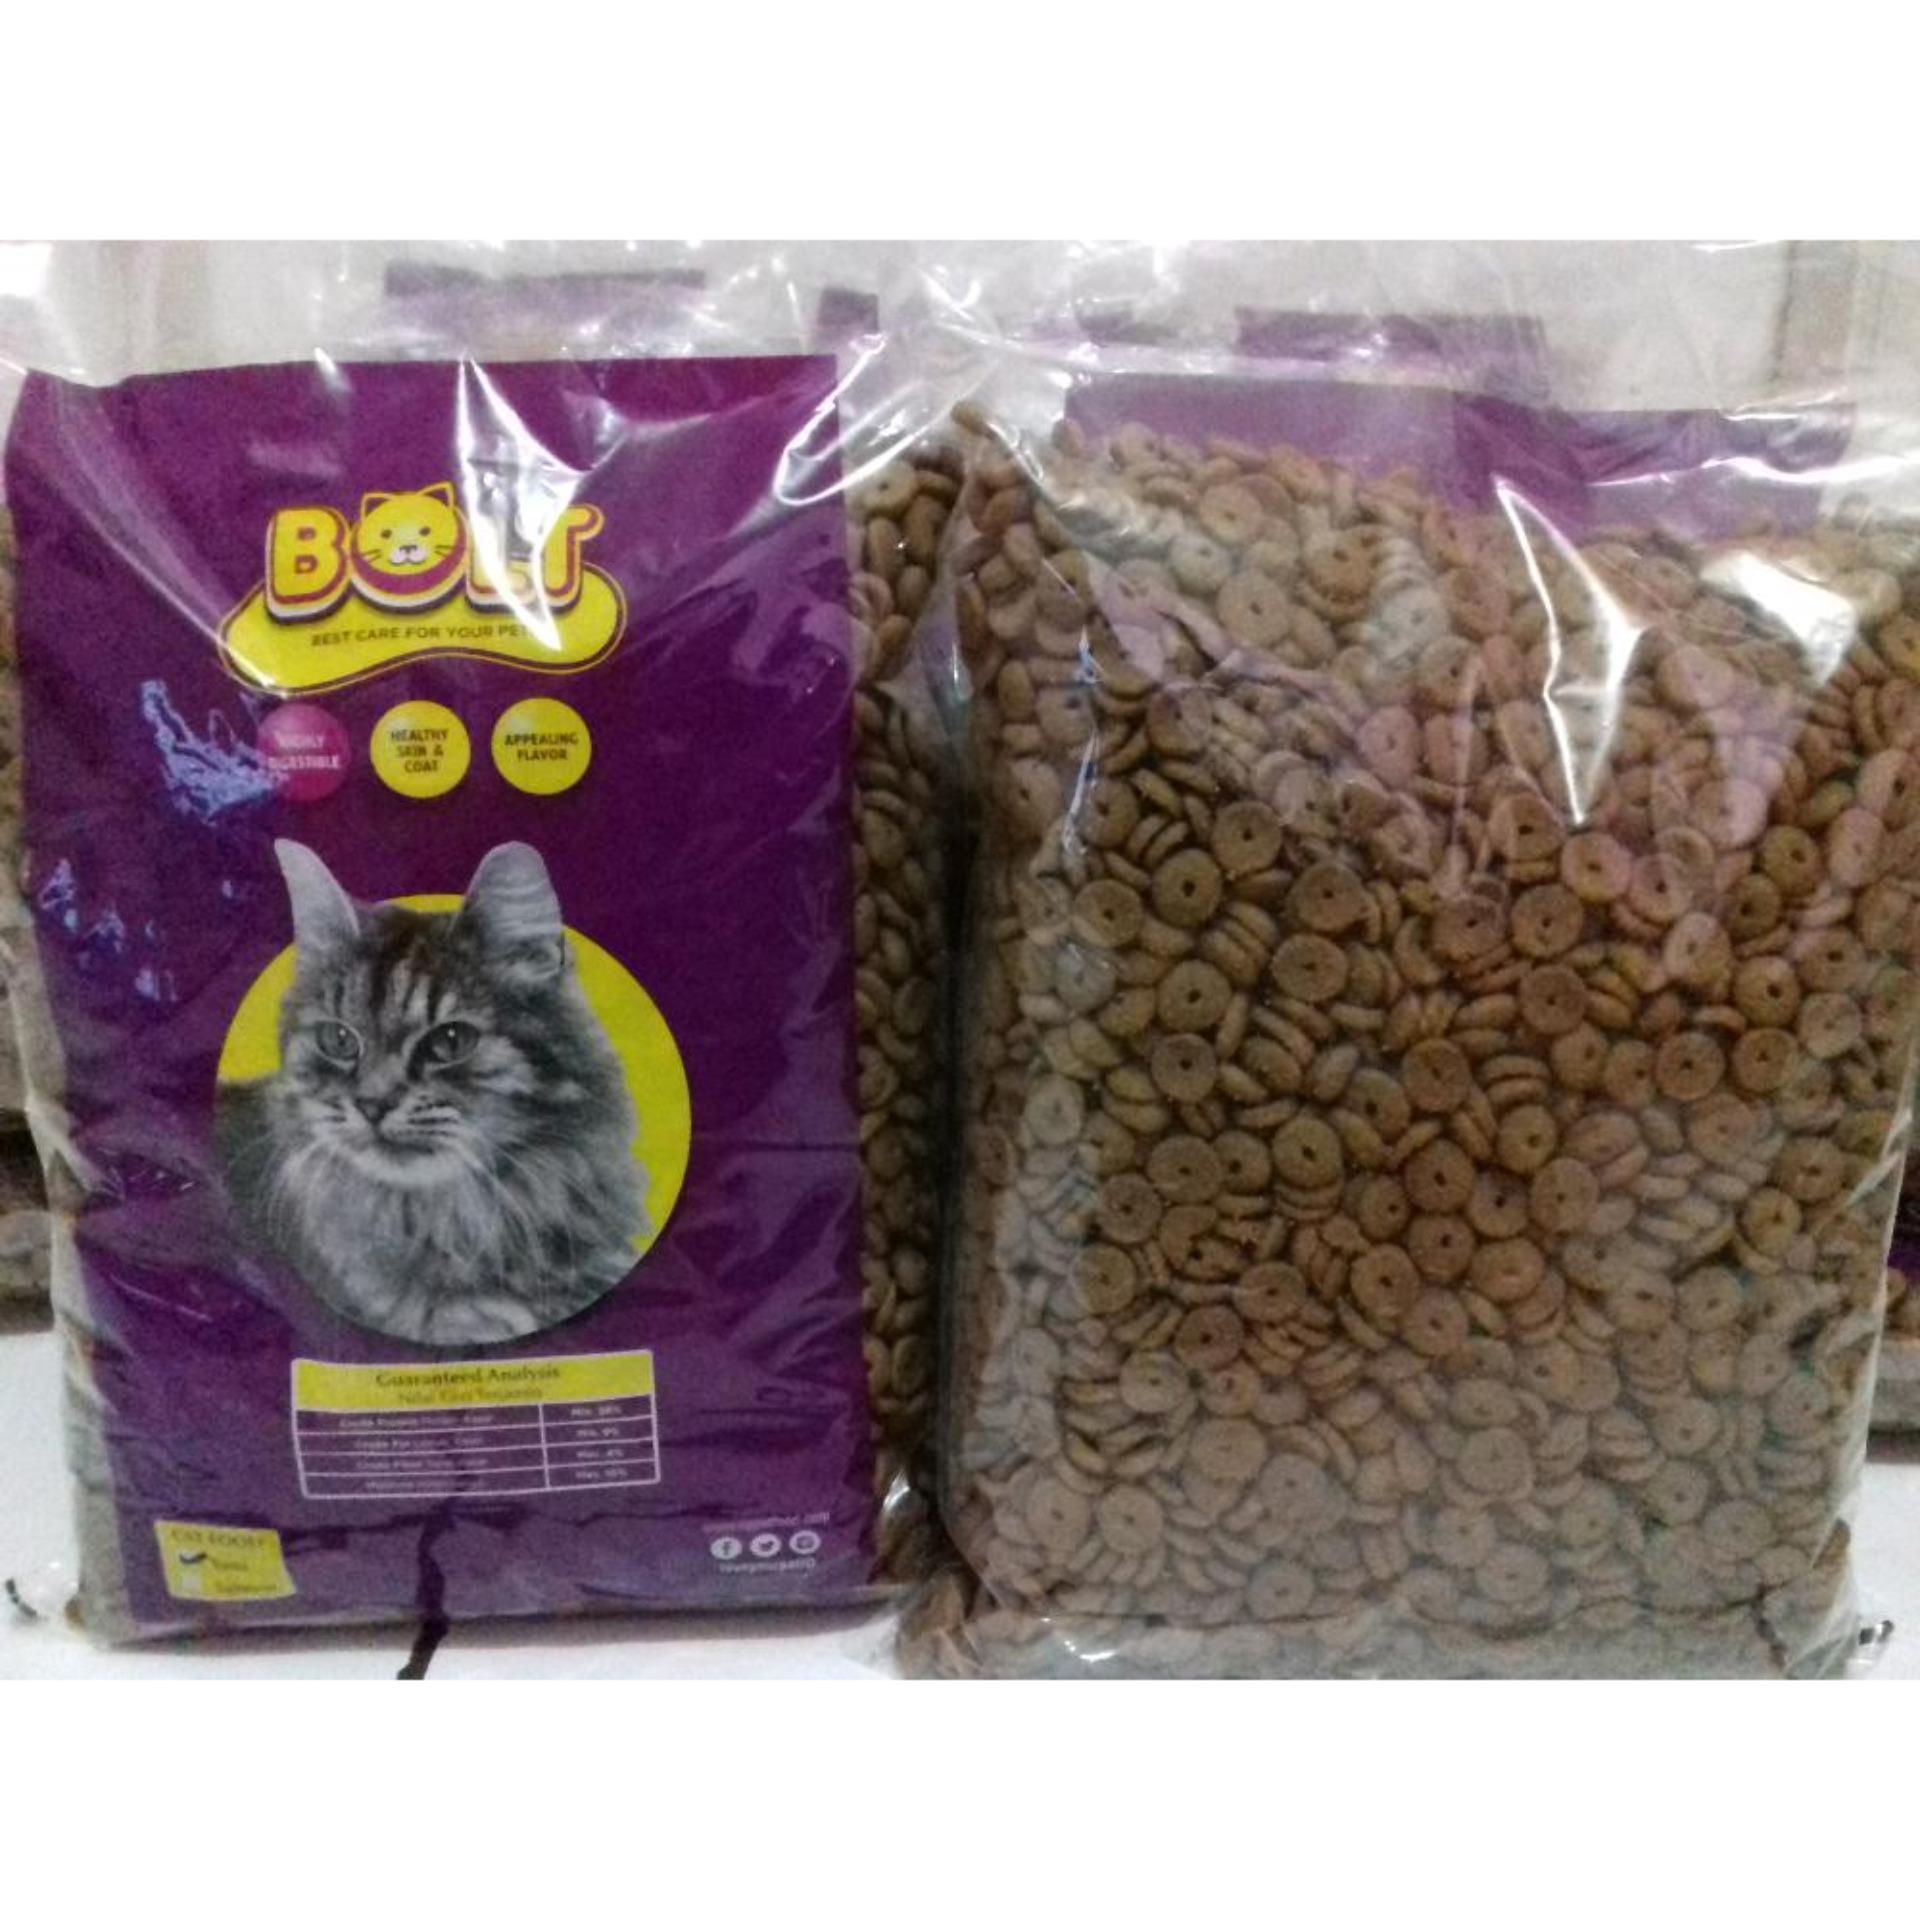 Kehebatan Beli 1 Geratis 2 Makanan Kucing Bolt Repack 1kg Dan Harga Maxi Cat Food Bentuk Donat Kg